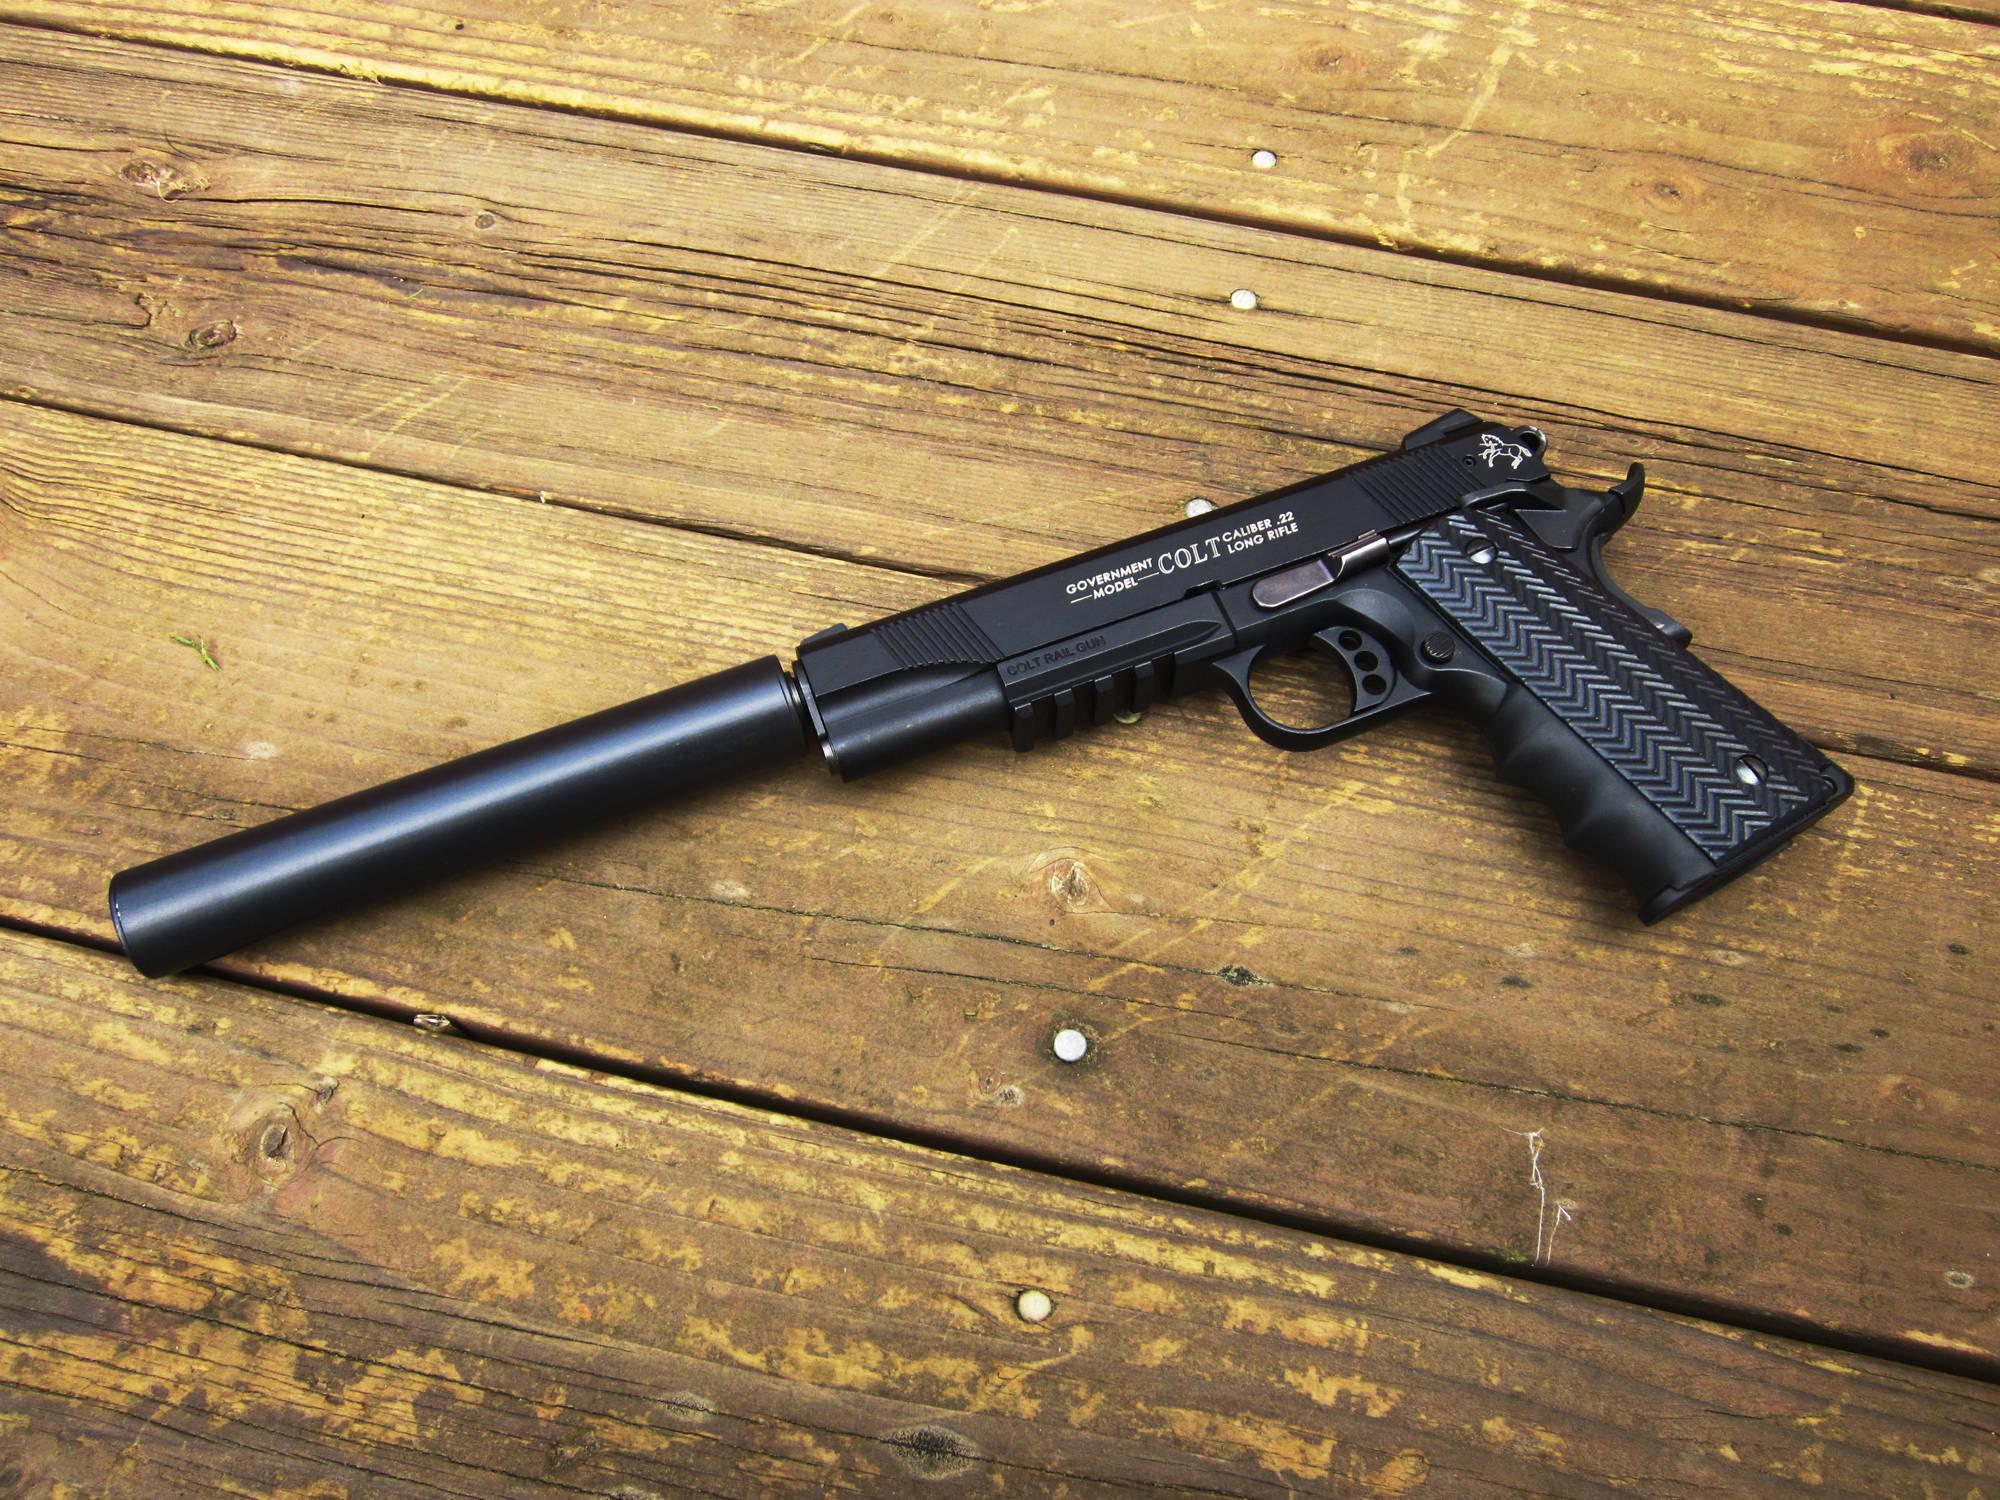 Colt Rail gun pistol silencer weapon revolver wallpaper background 2000x1500